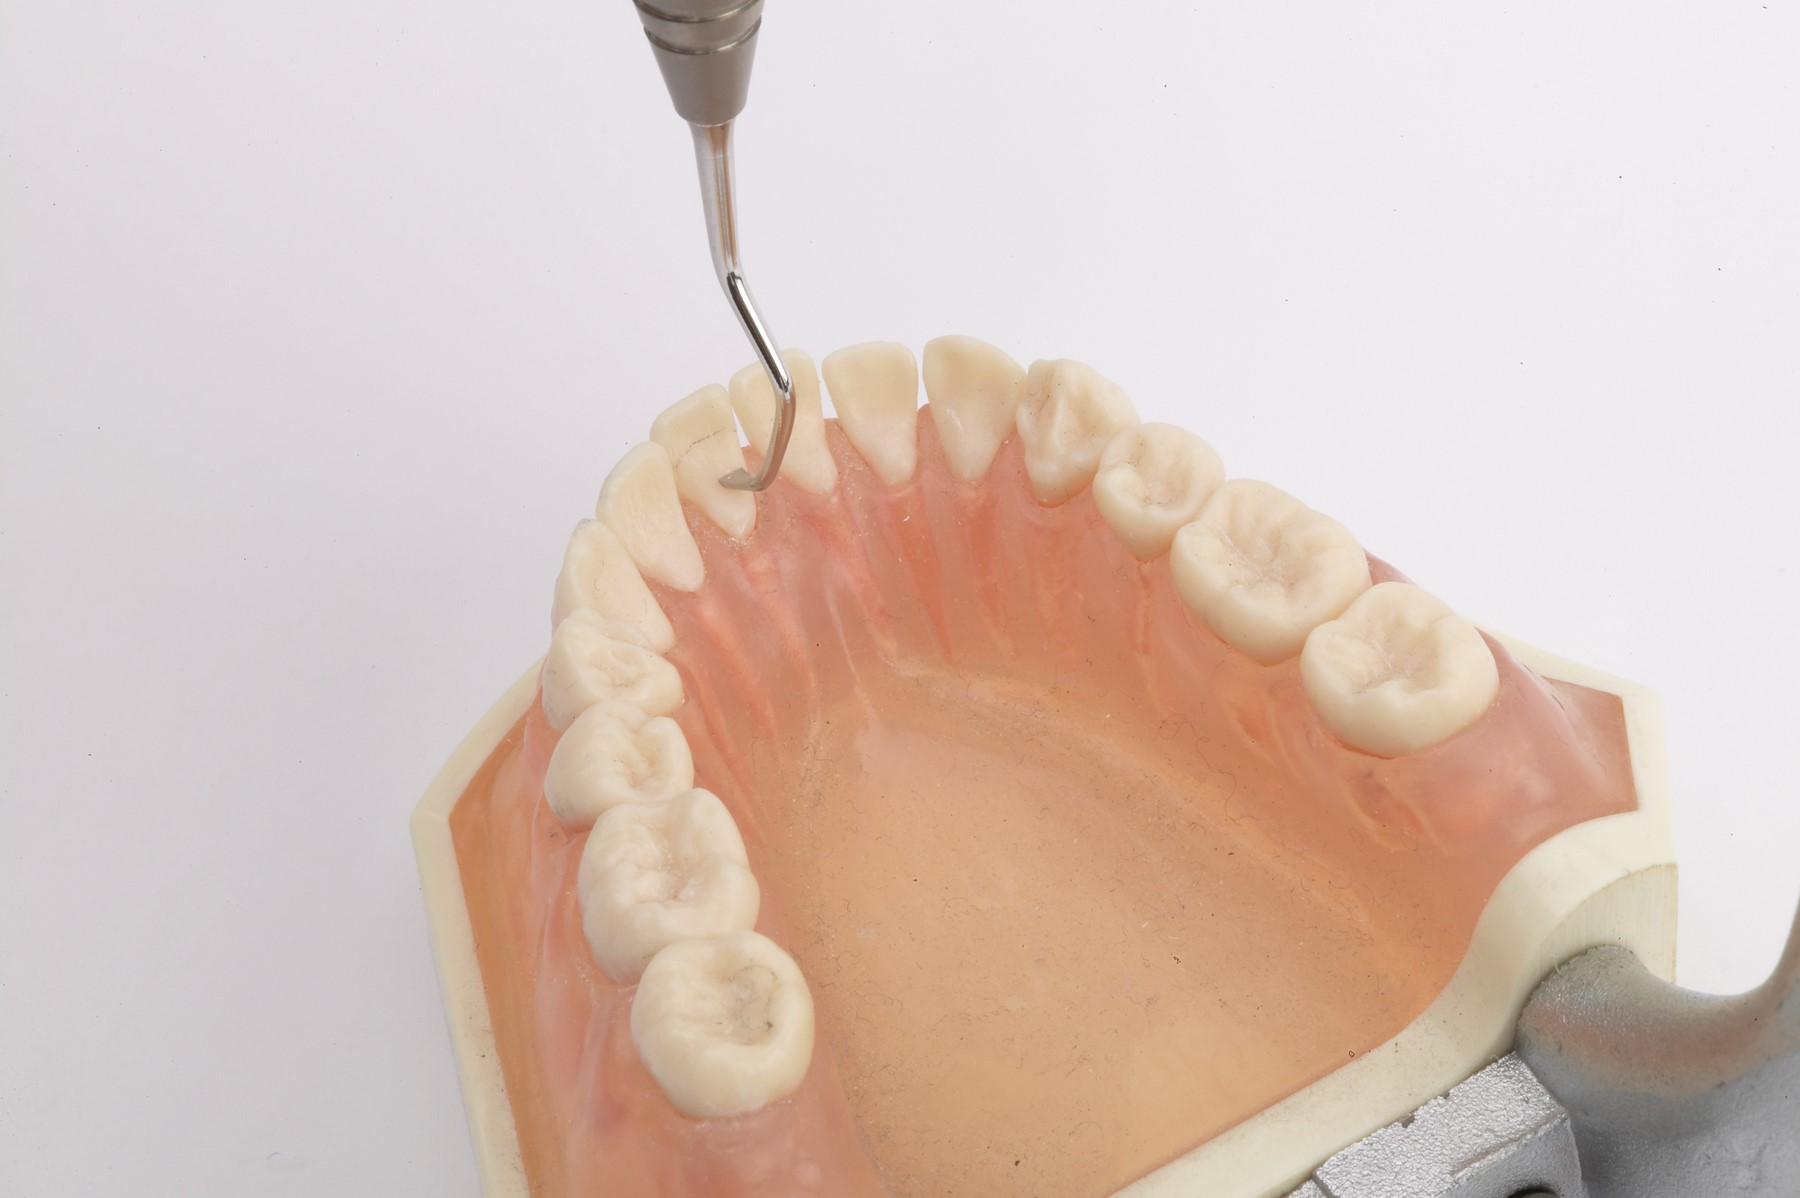 Anterior Lingual Stain Remover (ALSR)